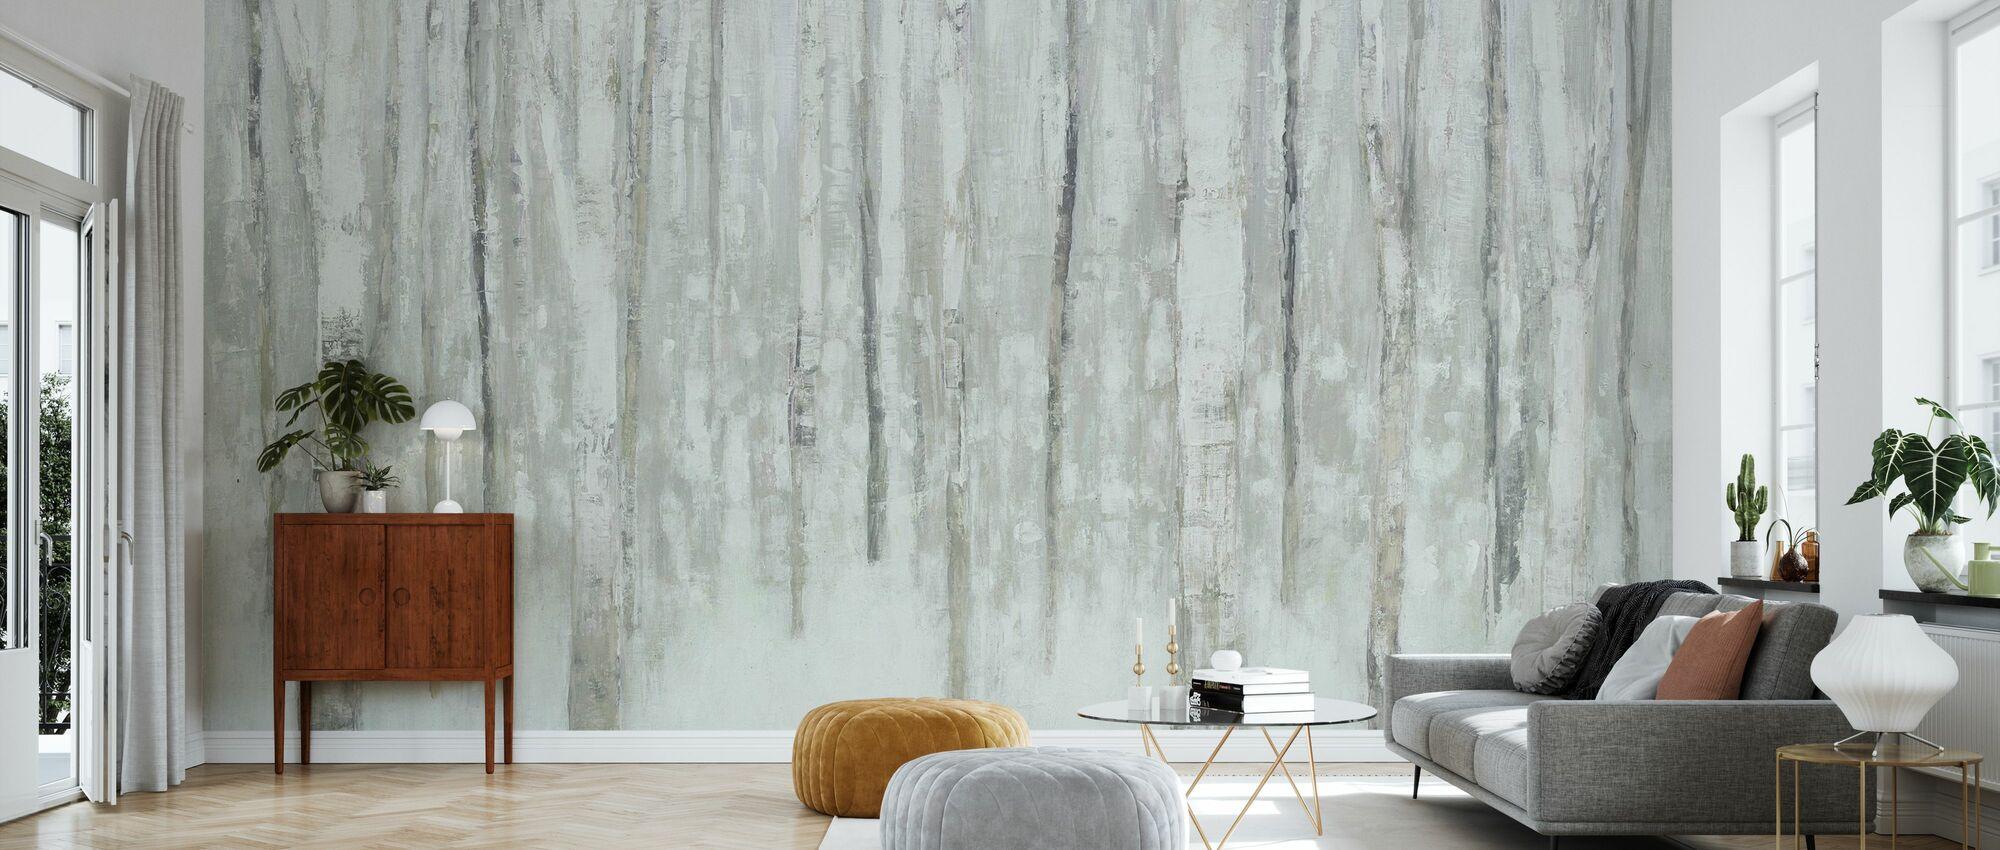 Birches en invierno - Papel pintado - Salón